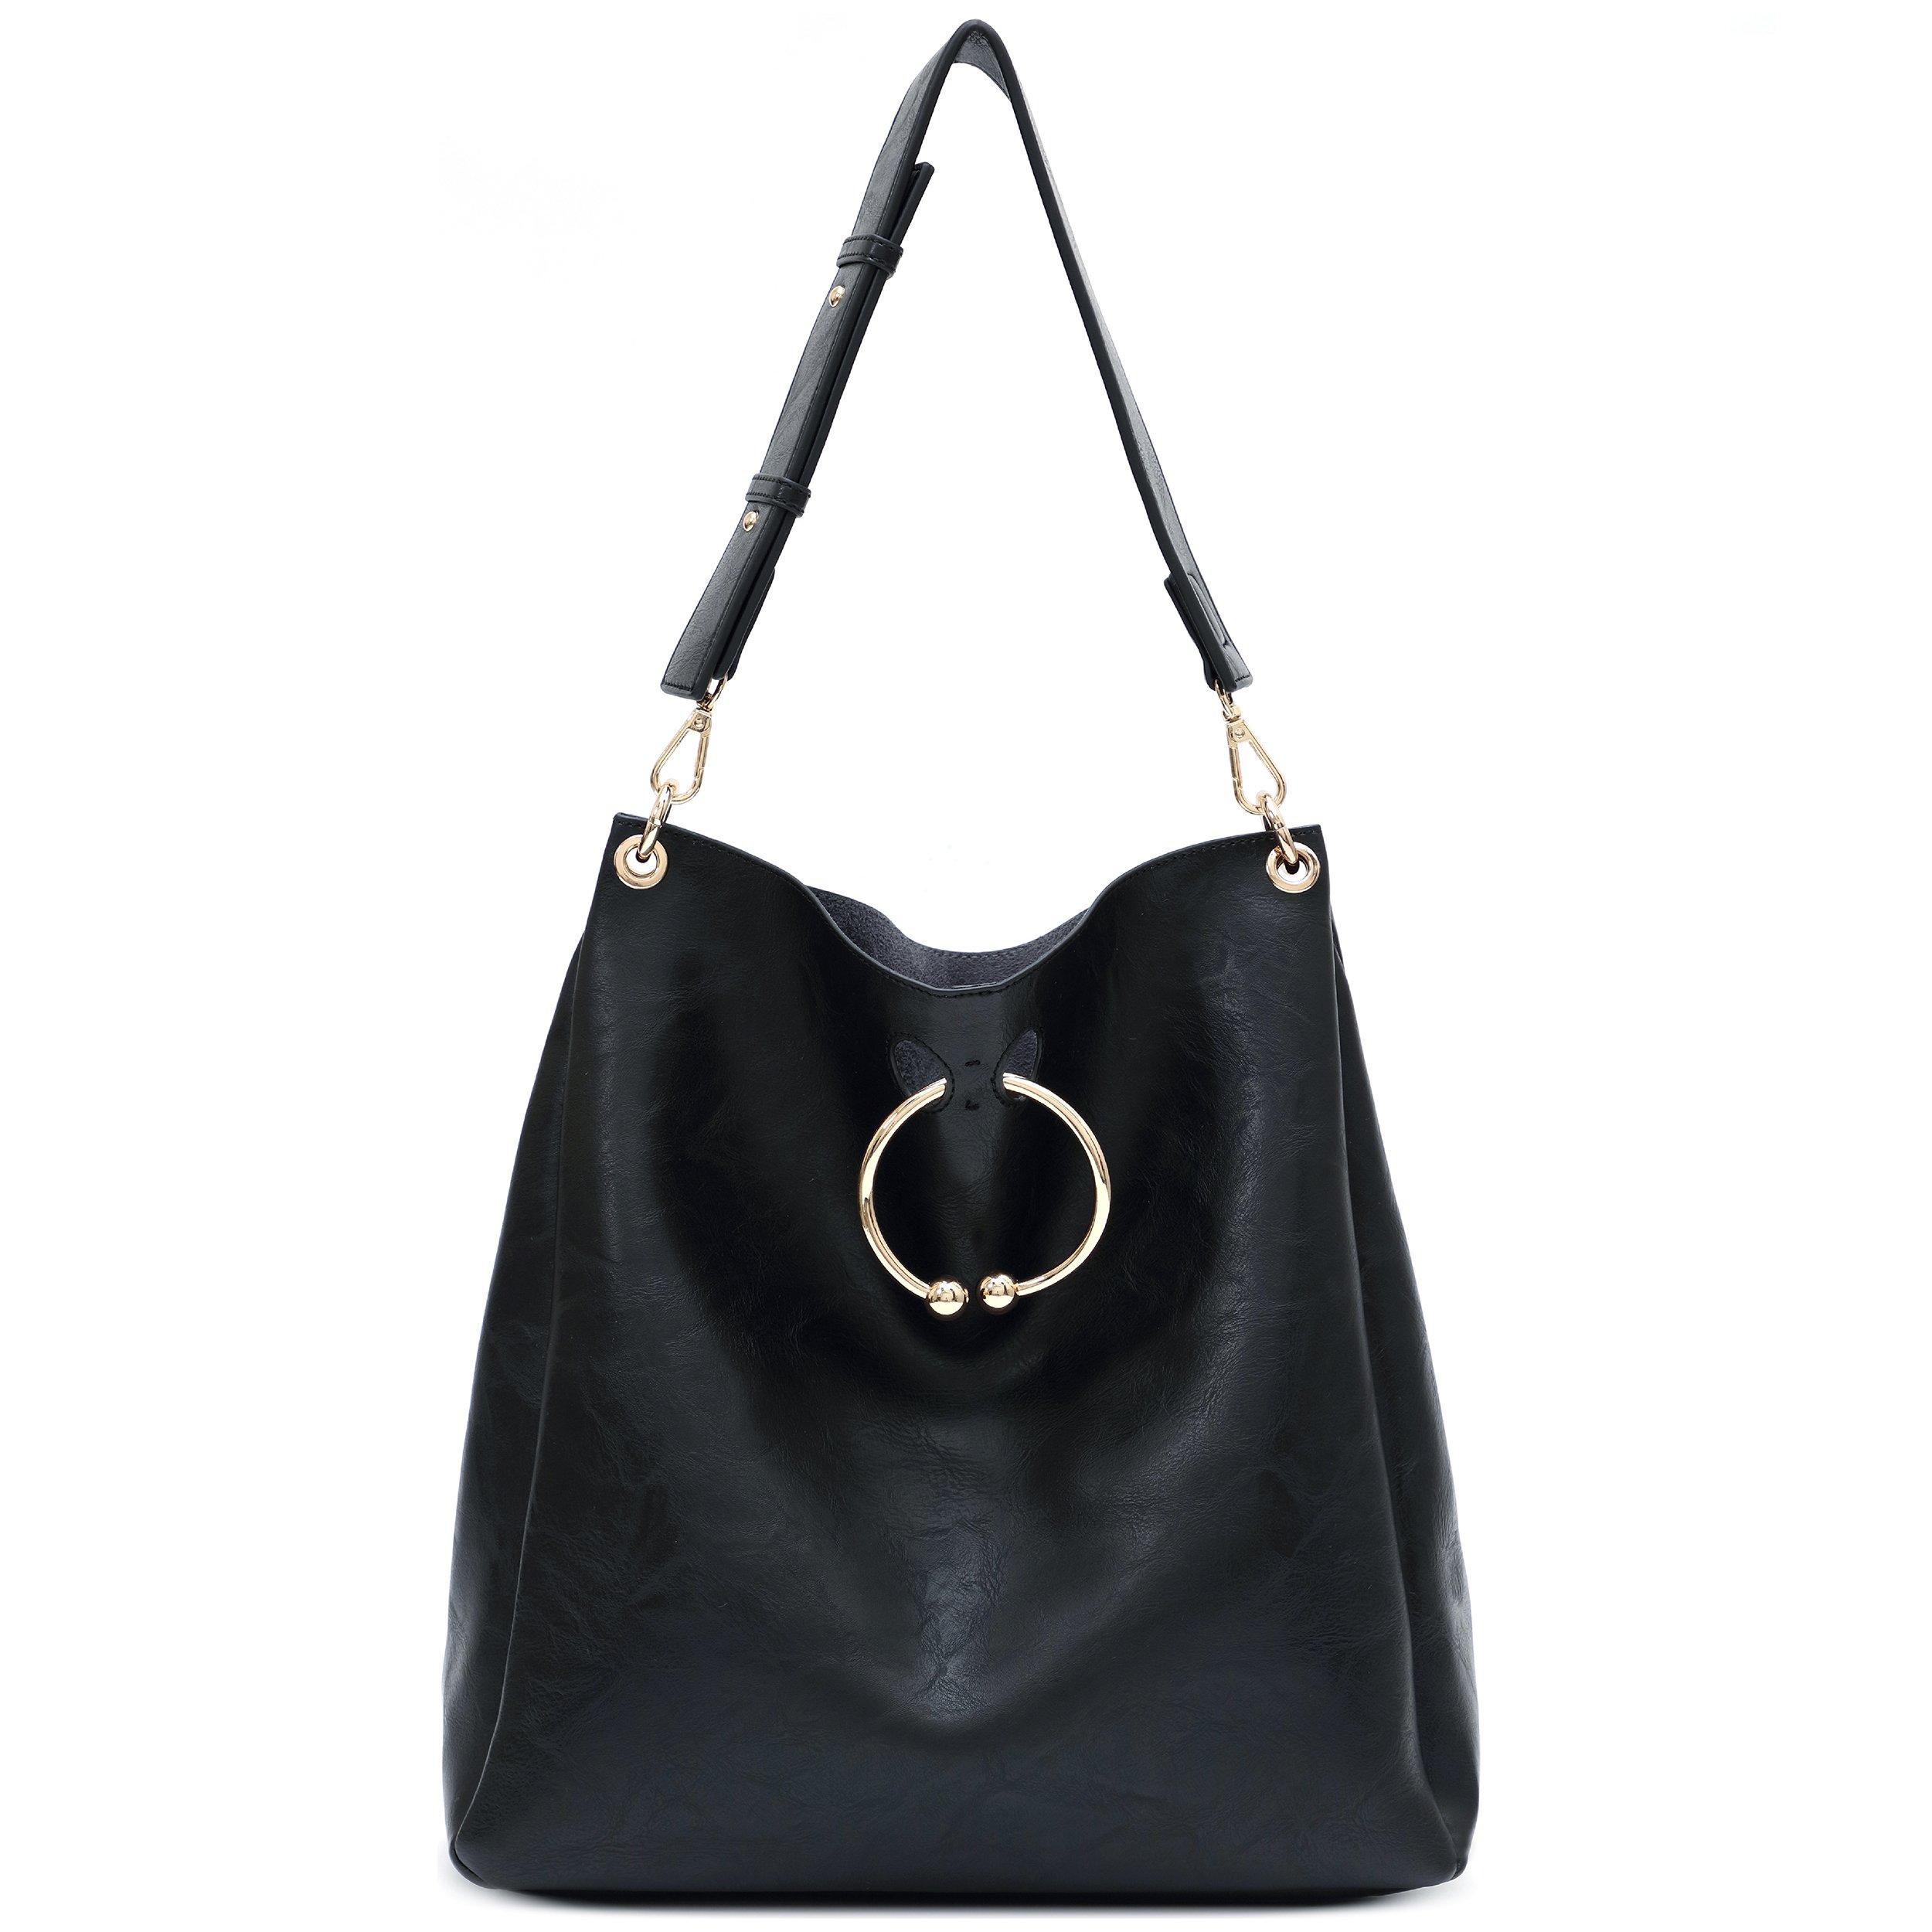 Women's Soft Faux Leather Hobo Handbags Ladies Shoulder Bag Tote Purse (Black)